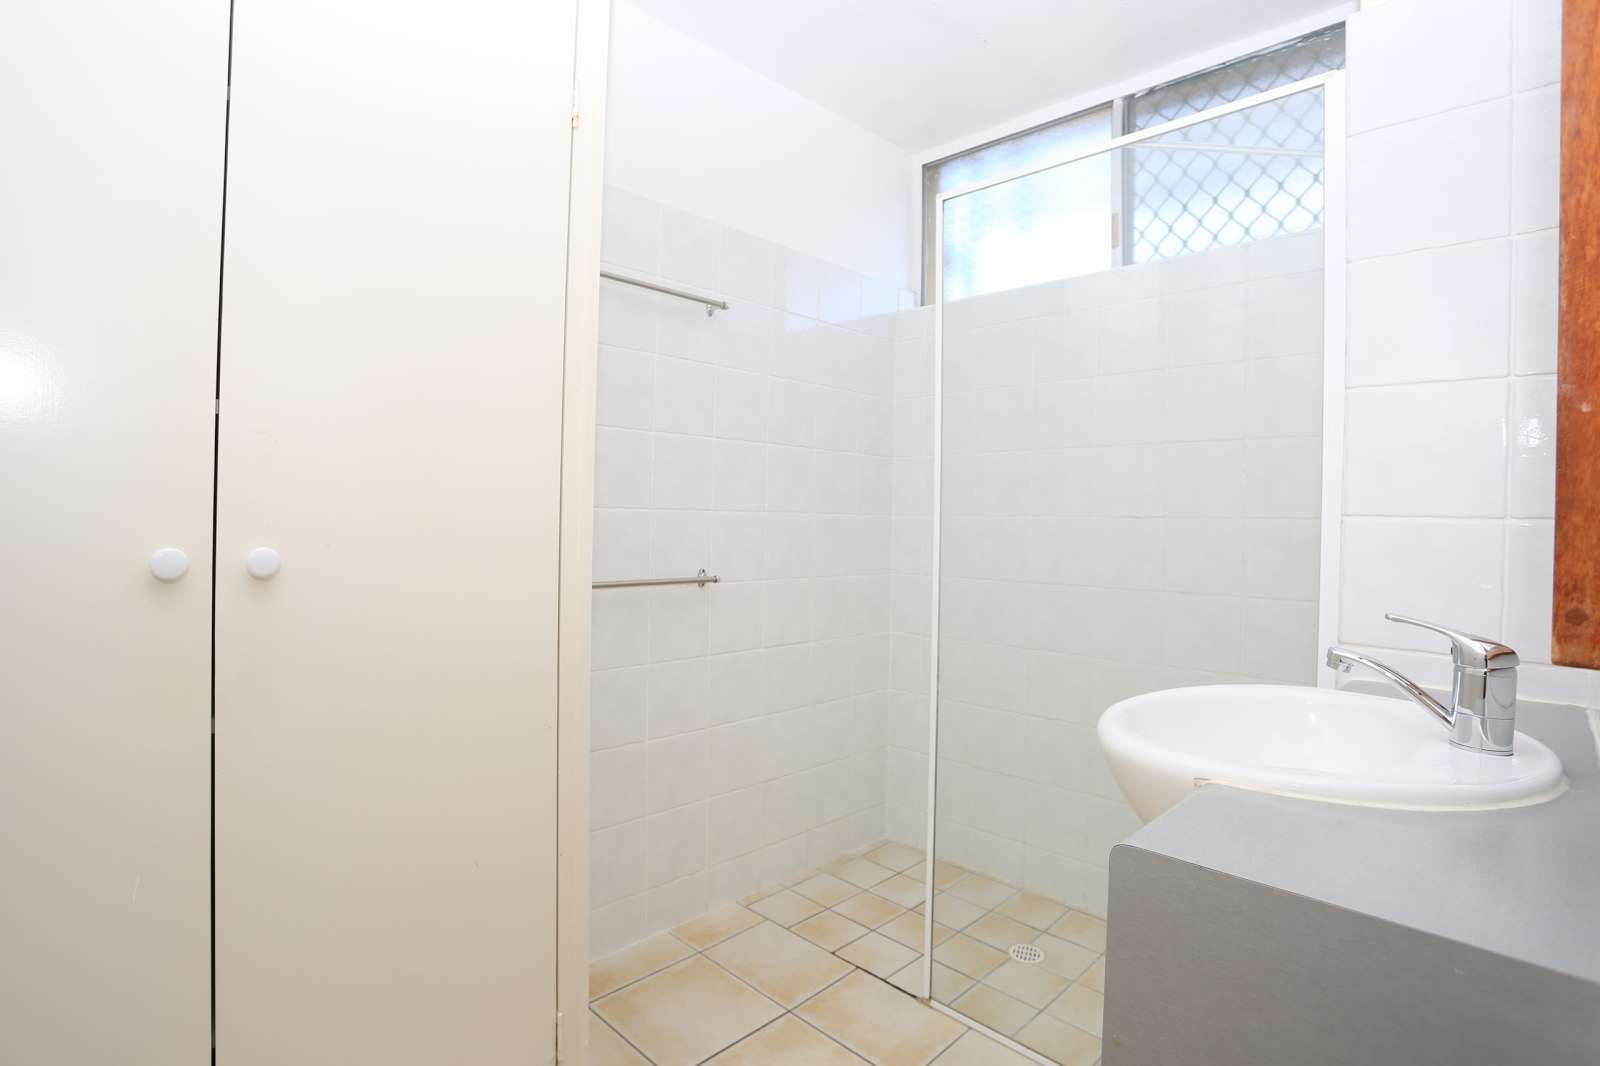 1/54 Lambert Road, Indooroopilly QLD 4068, Image 5